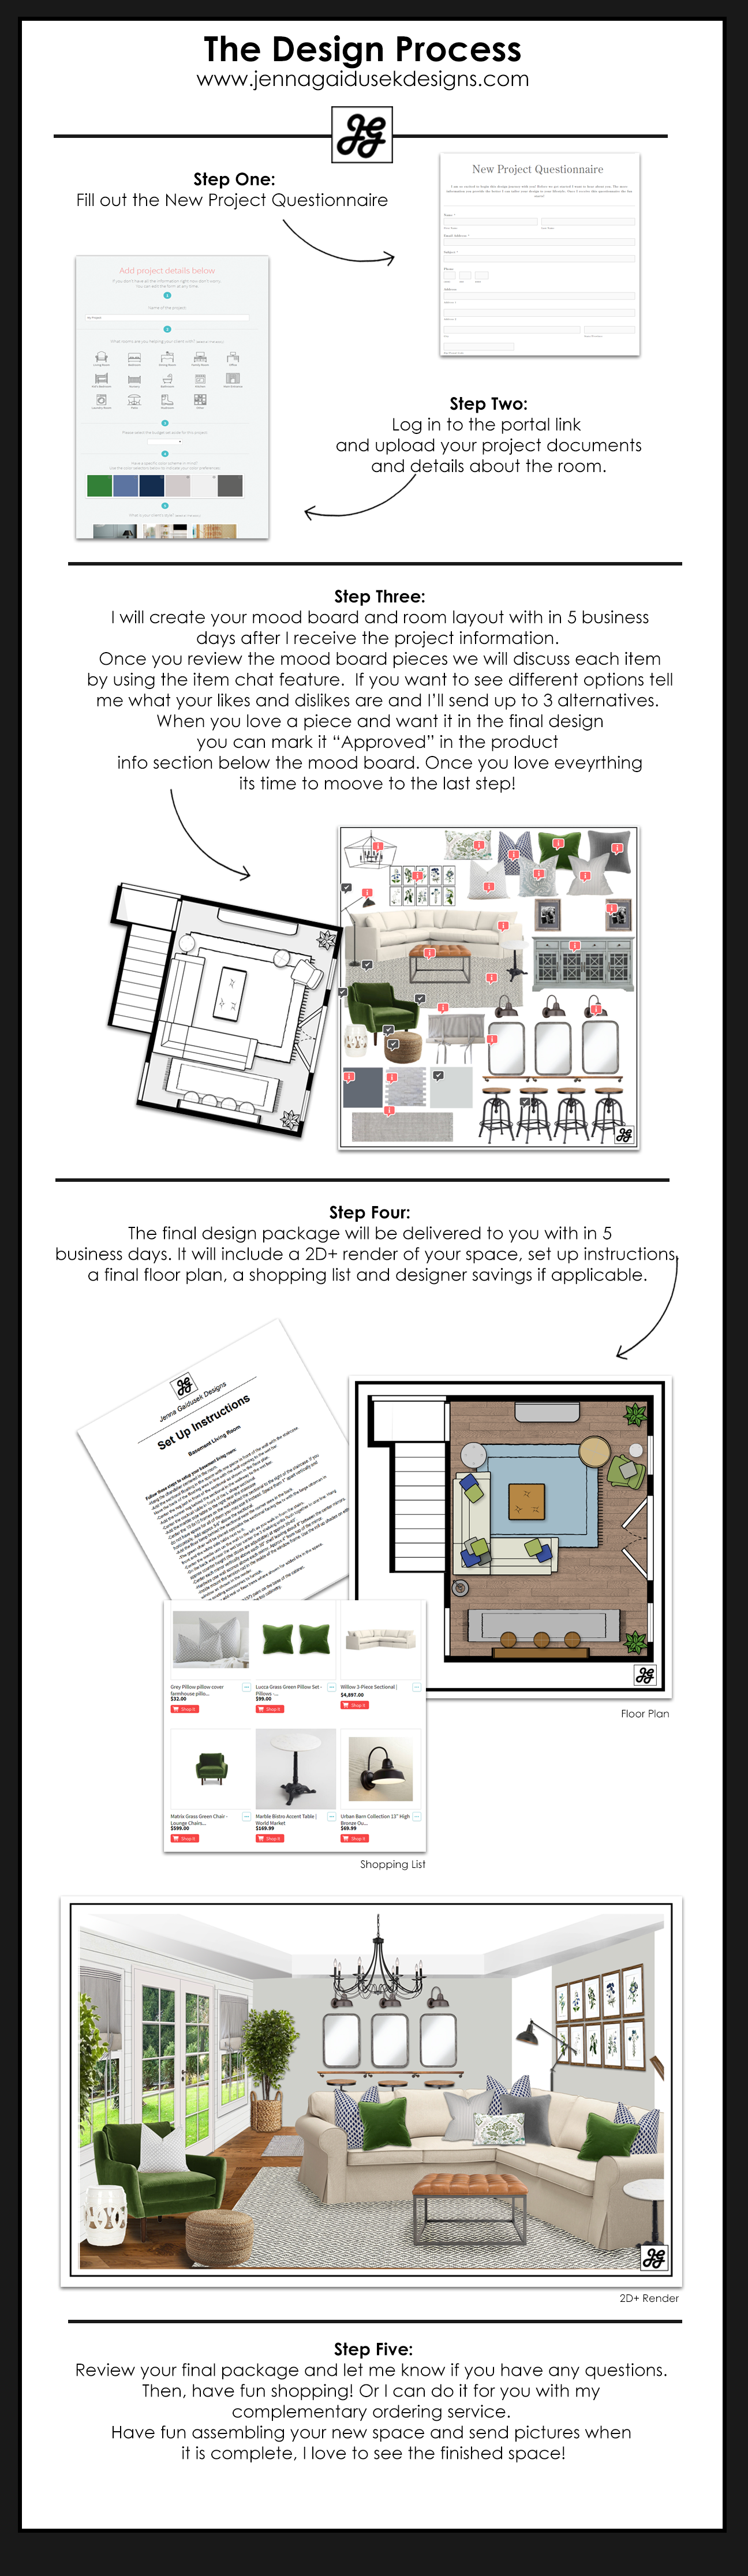 How online interior design works | Online interior design ...